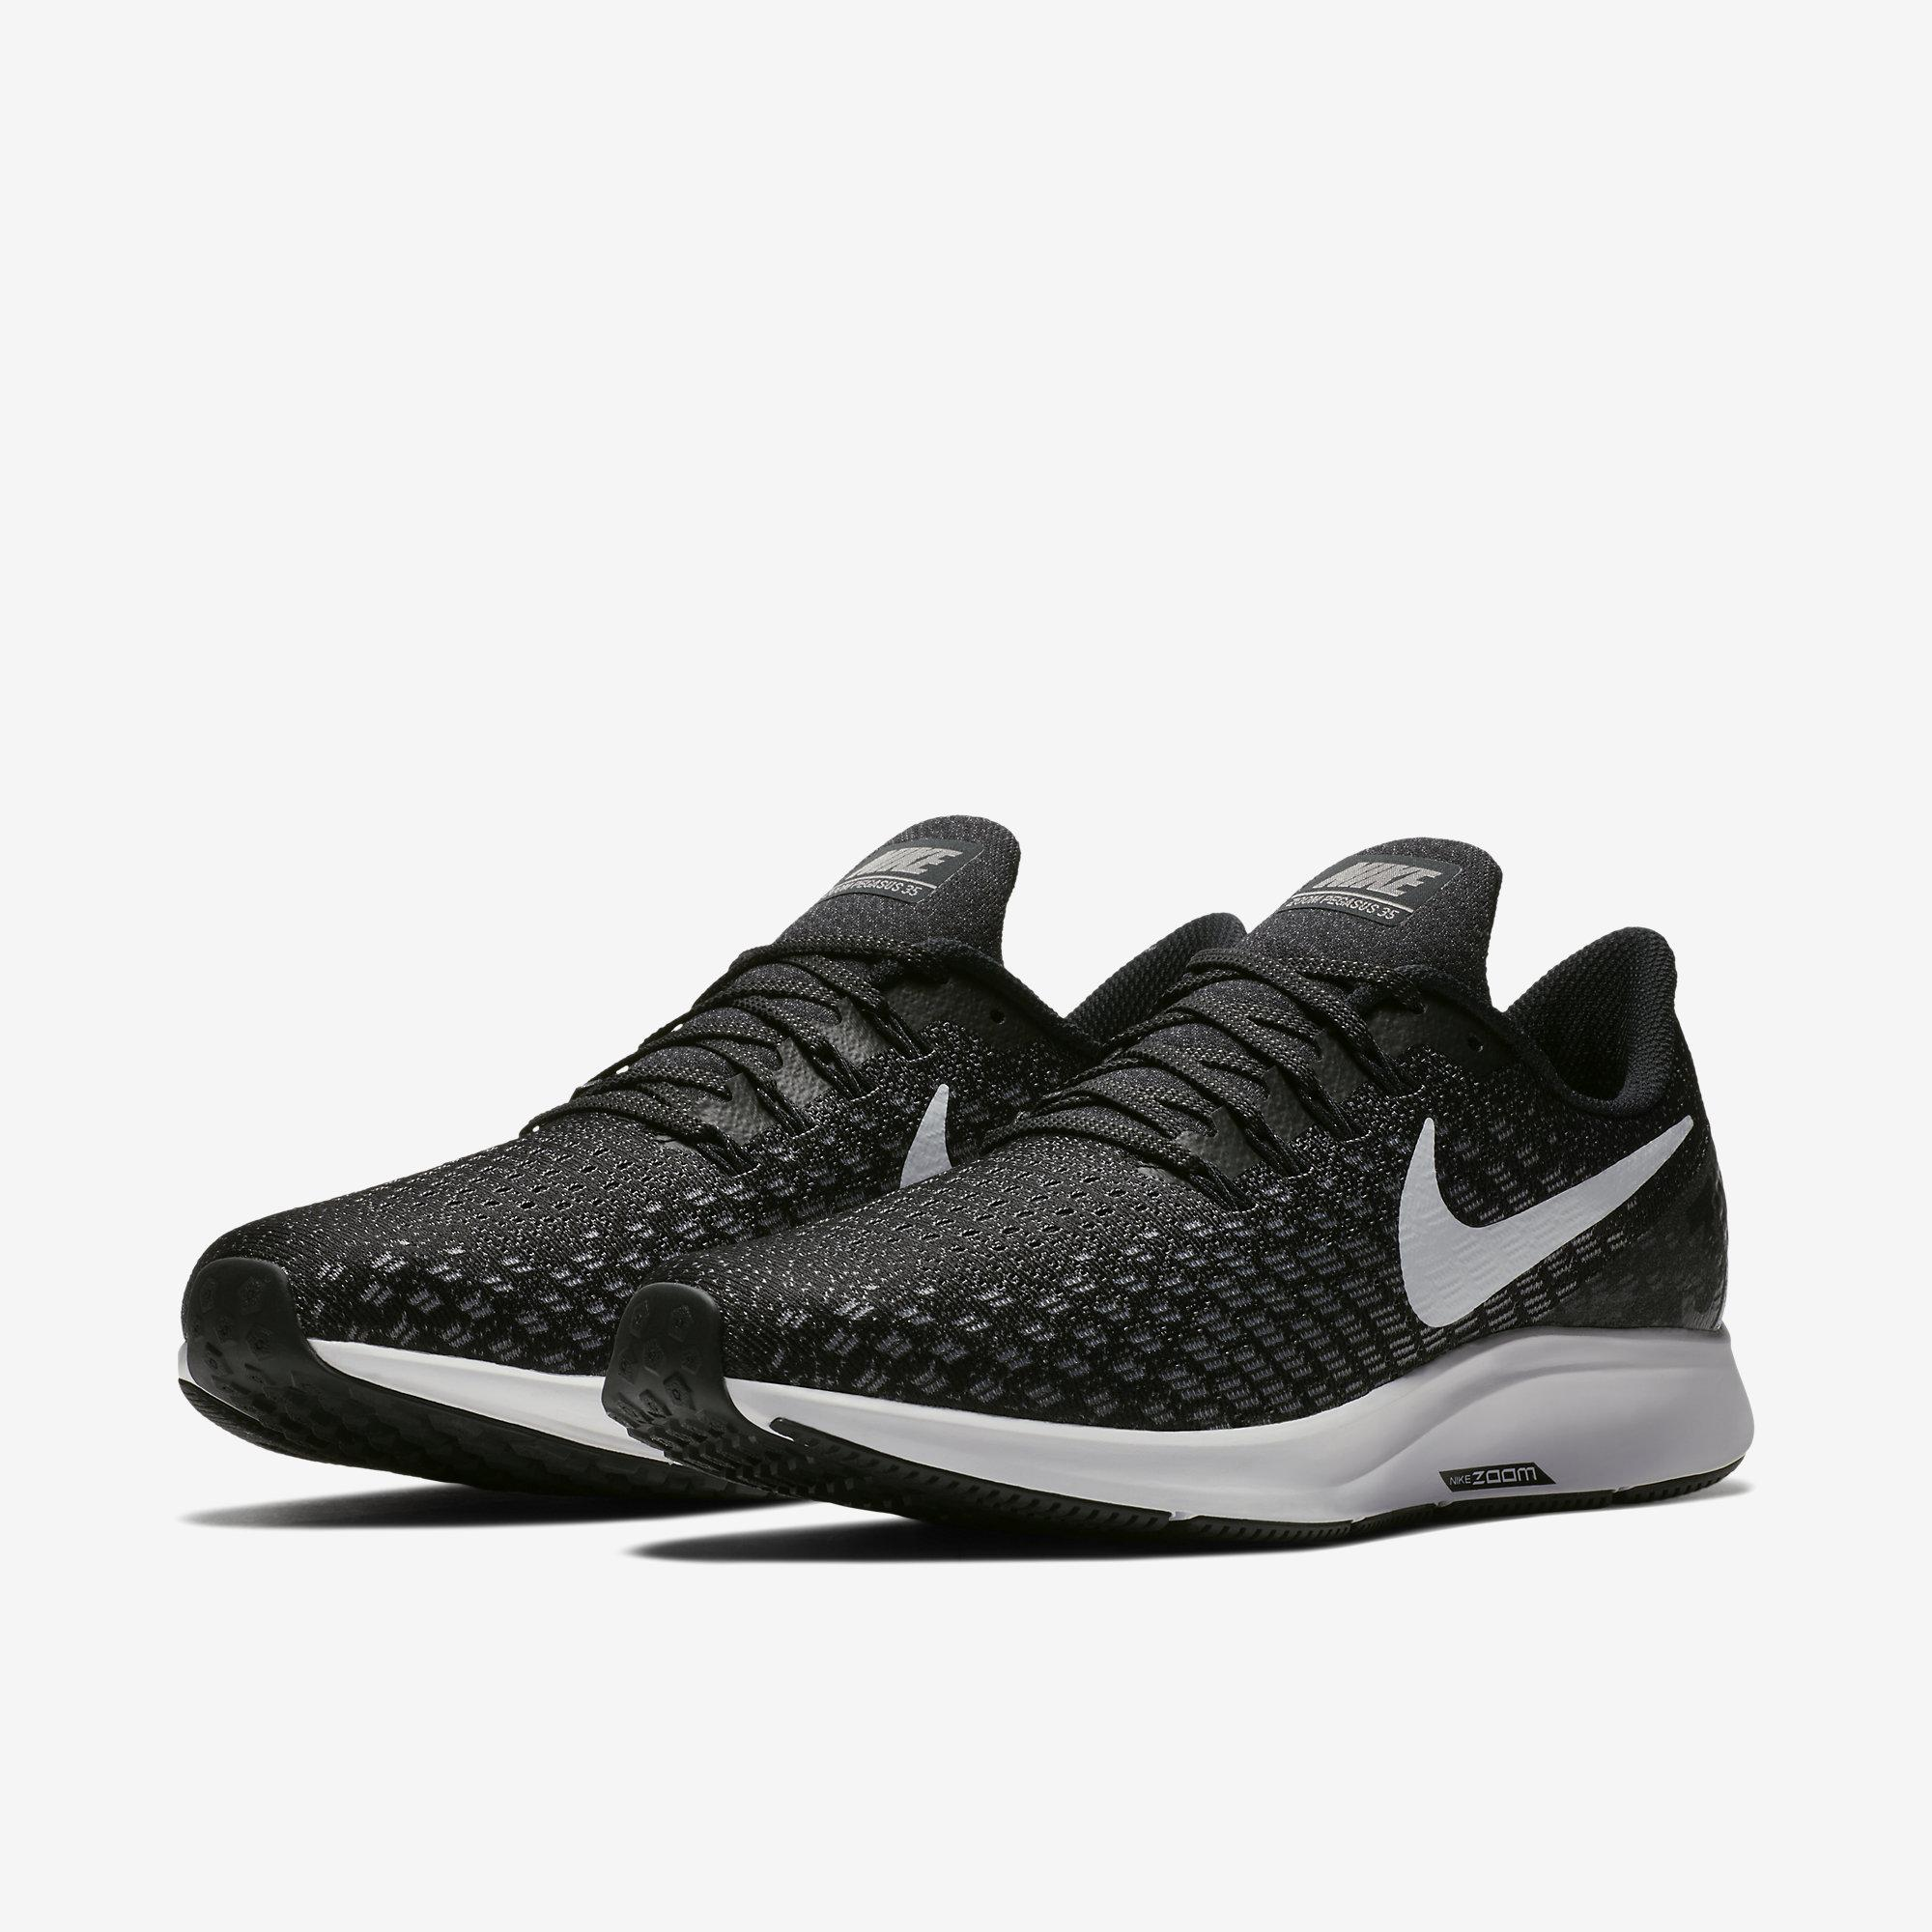 timeless design f7553 00d70 Nike Mens Air Zoom Pegasus 35 Running Shoes - Black/Gunsmoke/Oil Grey